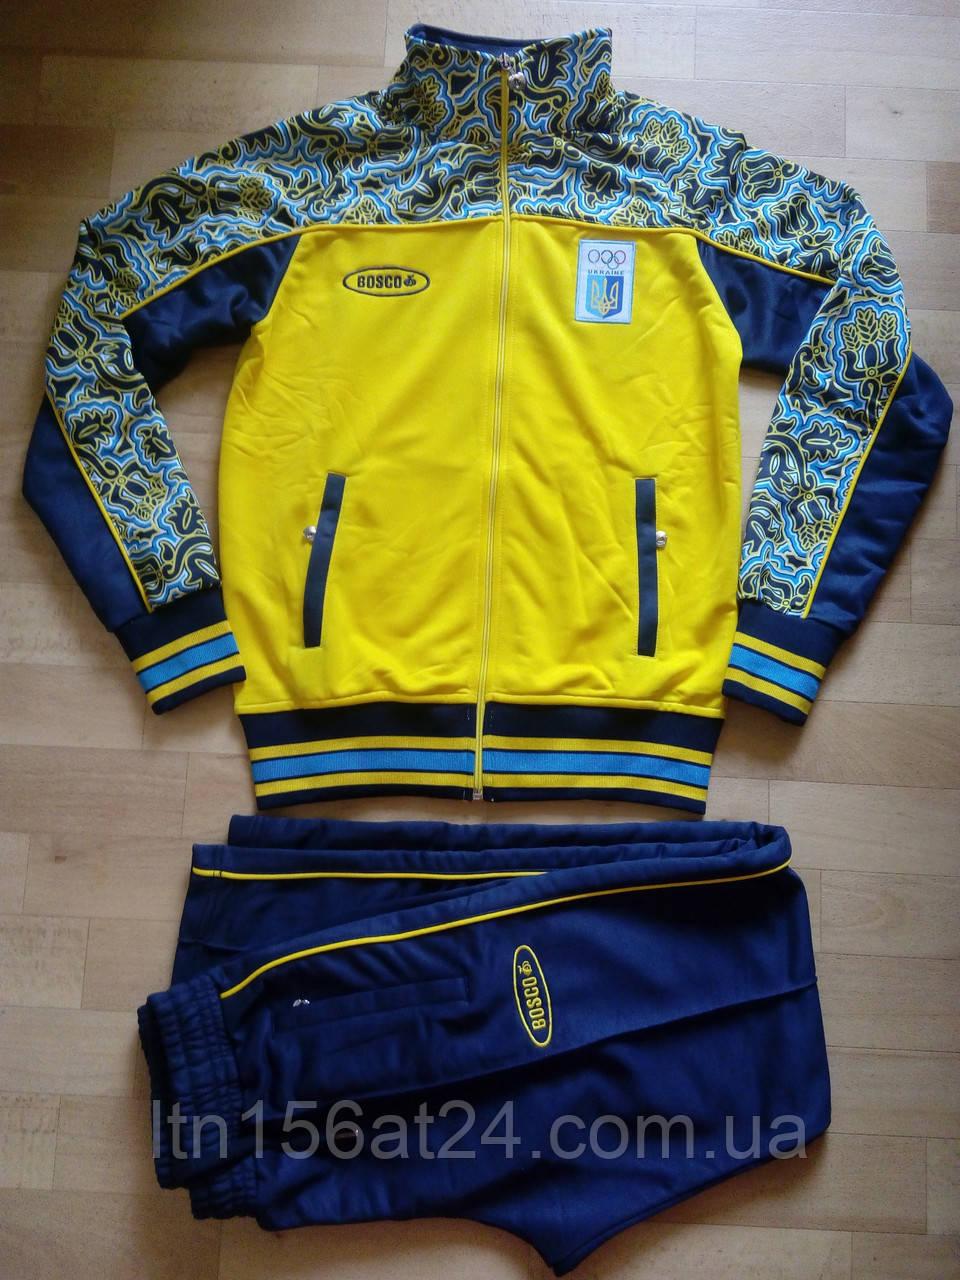 7cb83c78 Спортивный костюм Bosco sport Ukraine. Боско спорт Украина оригинал, ...